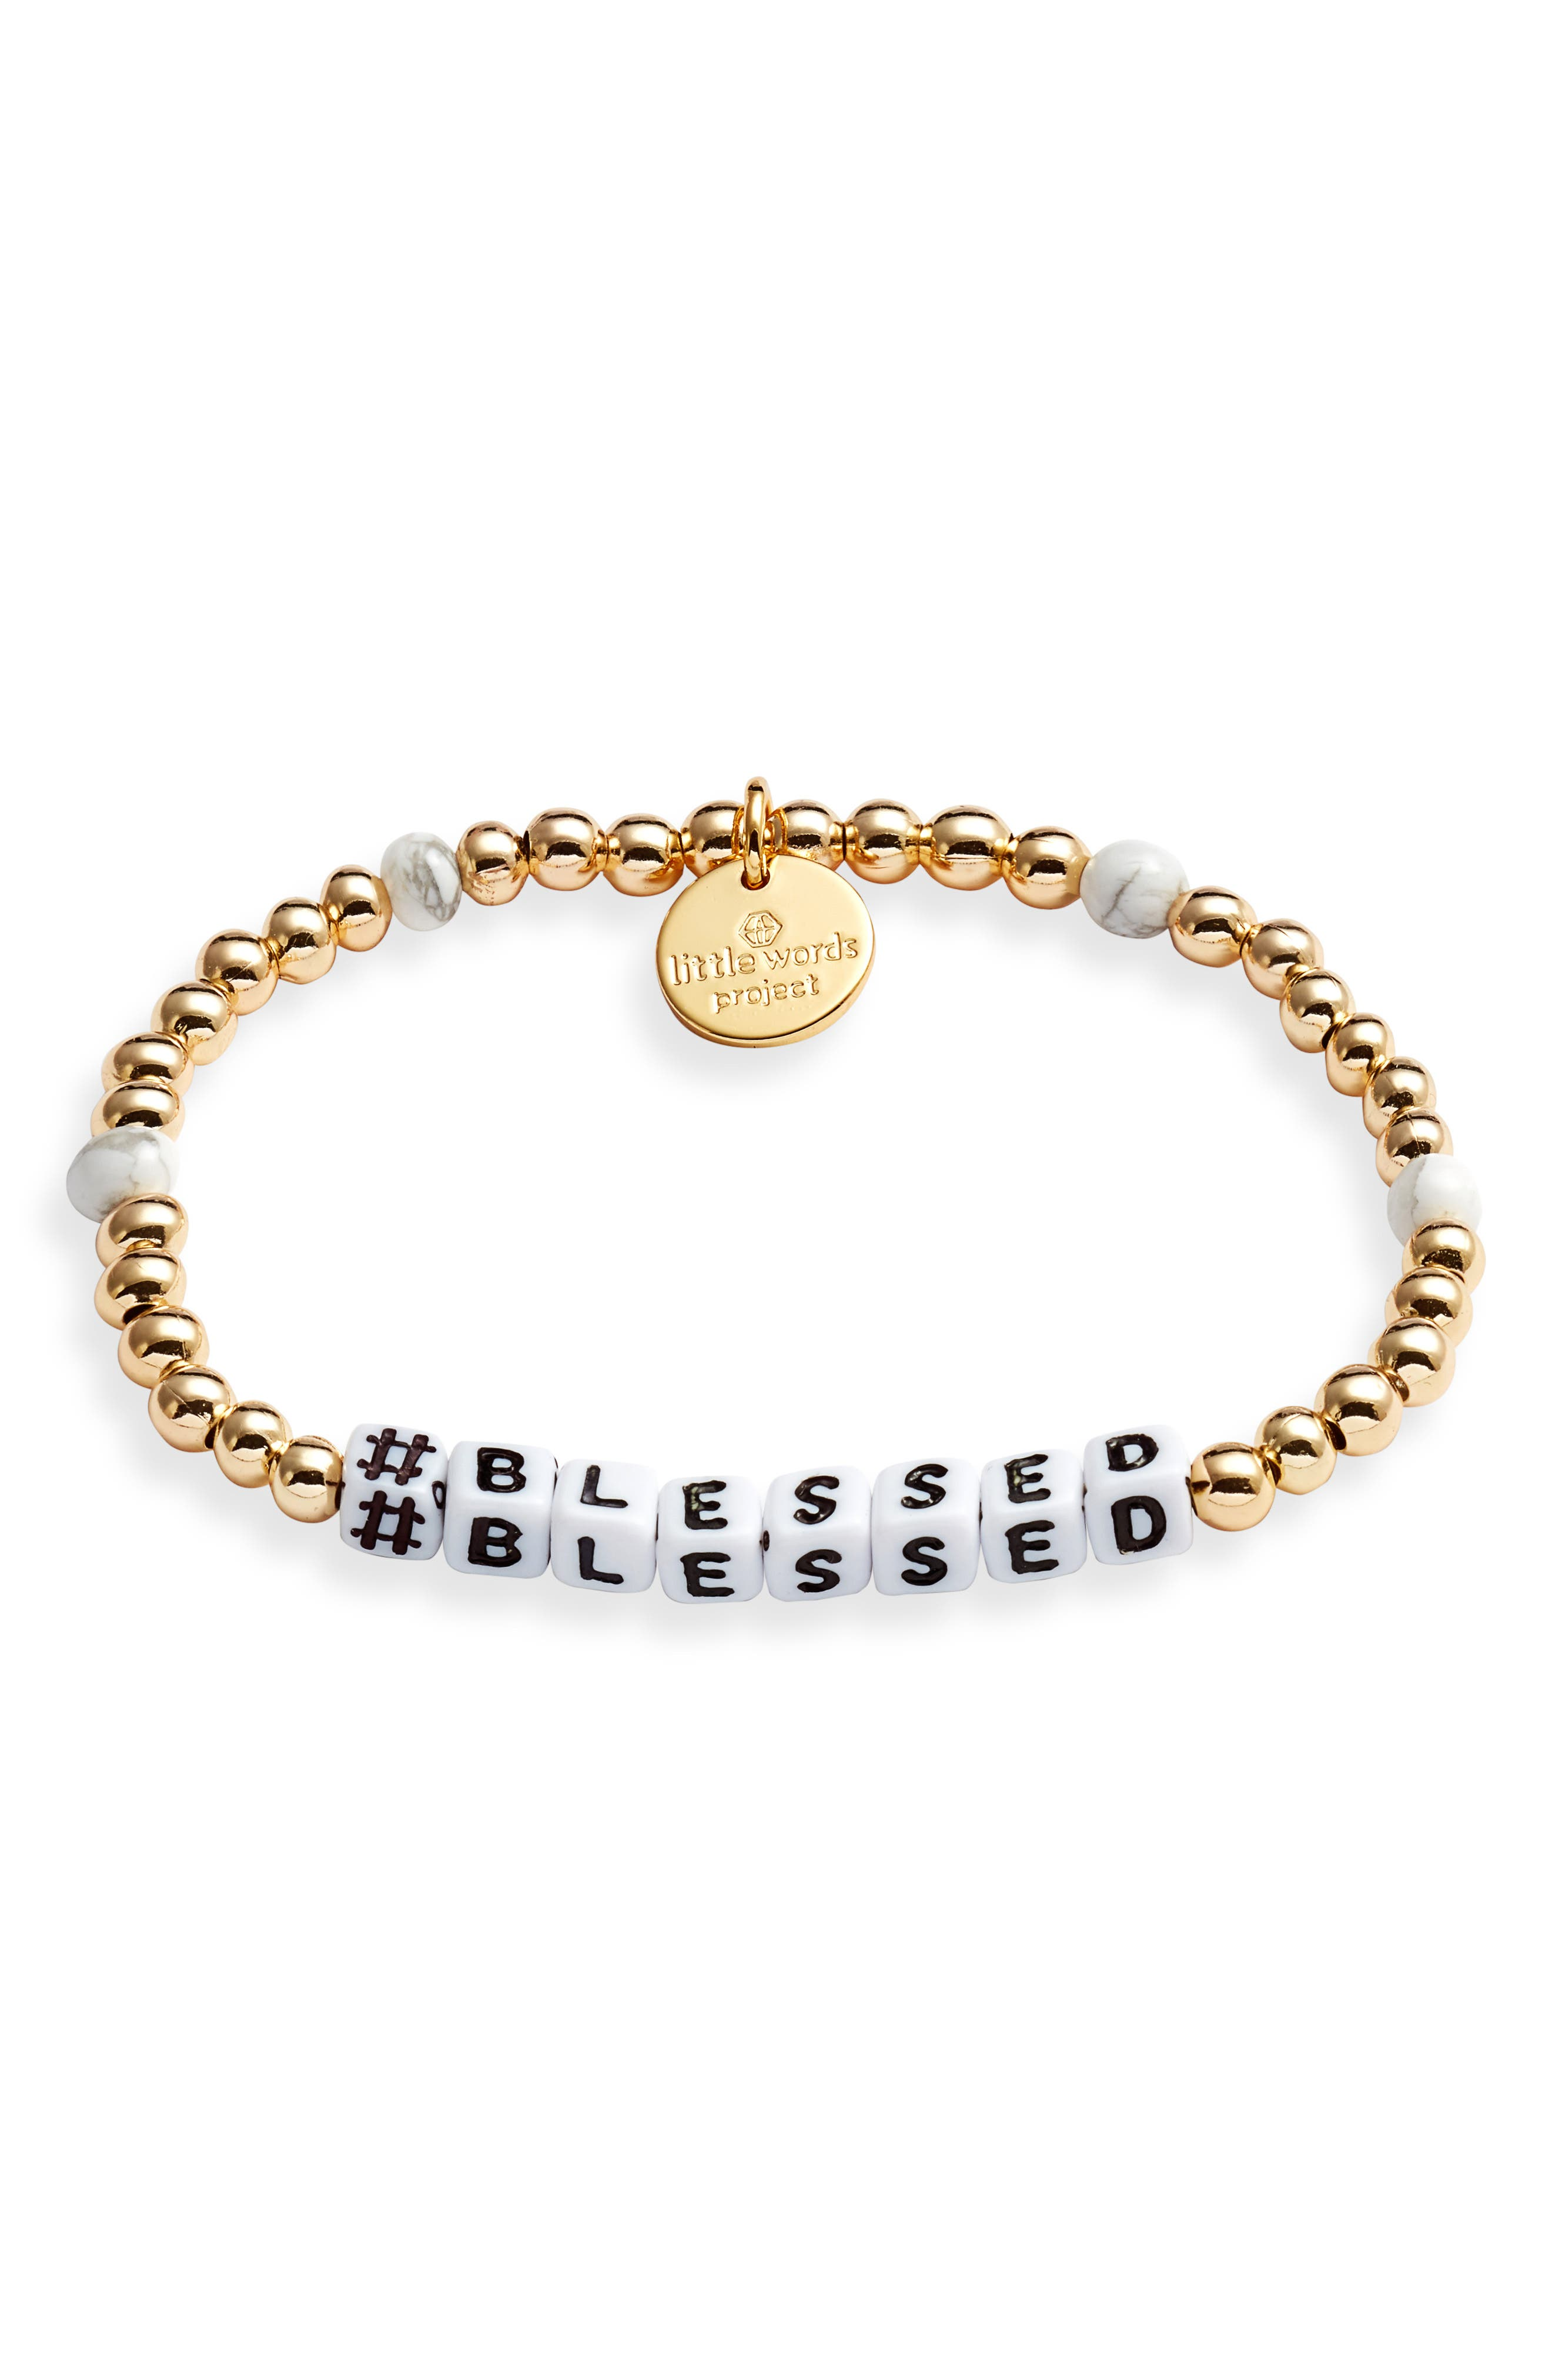 #blessed Beaded Stretch Bracelet